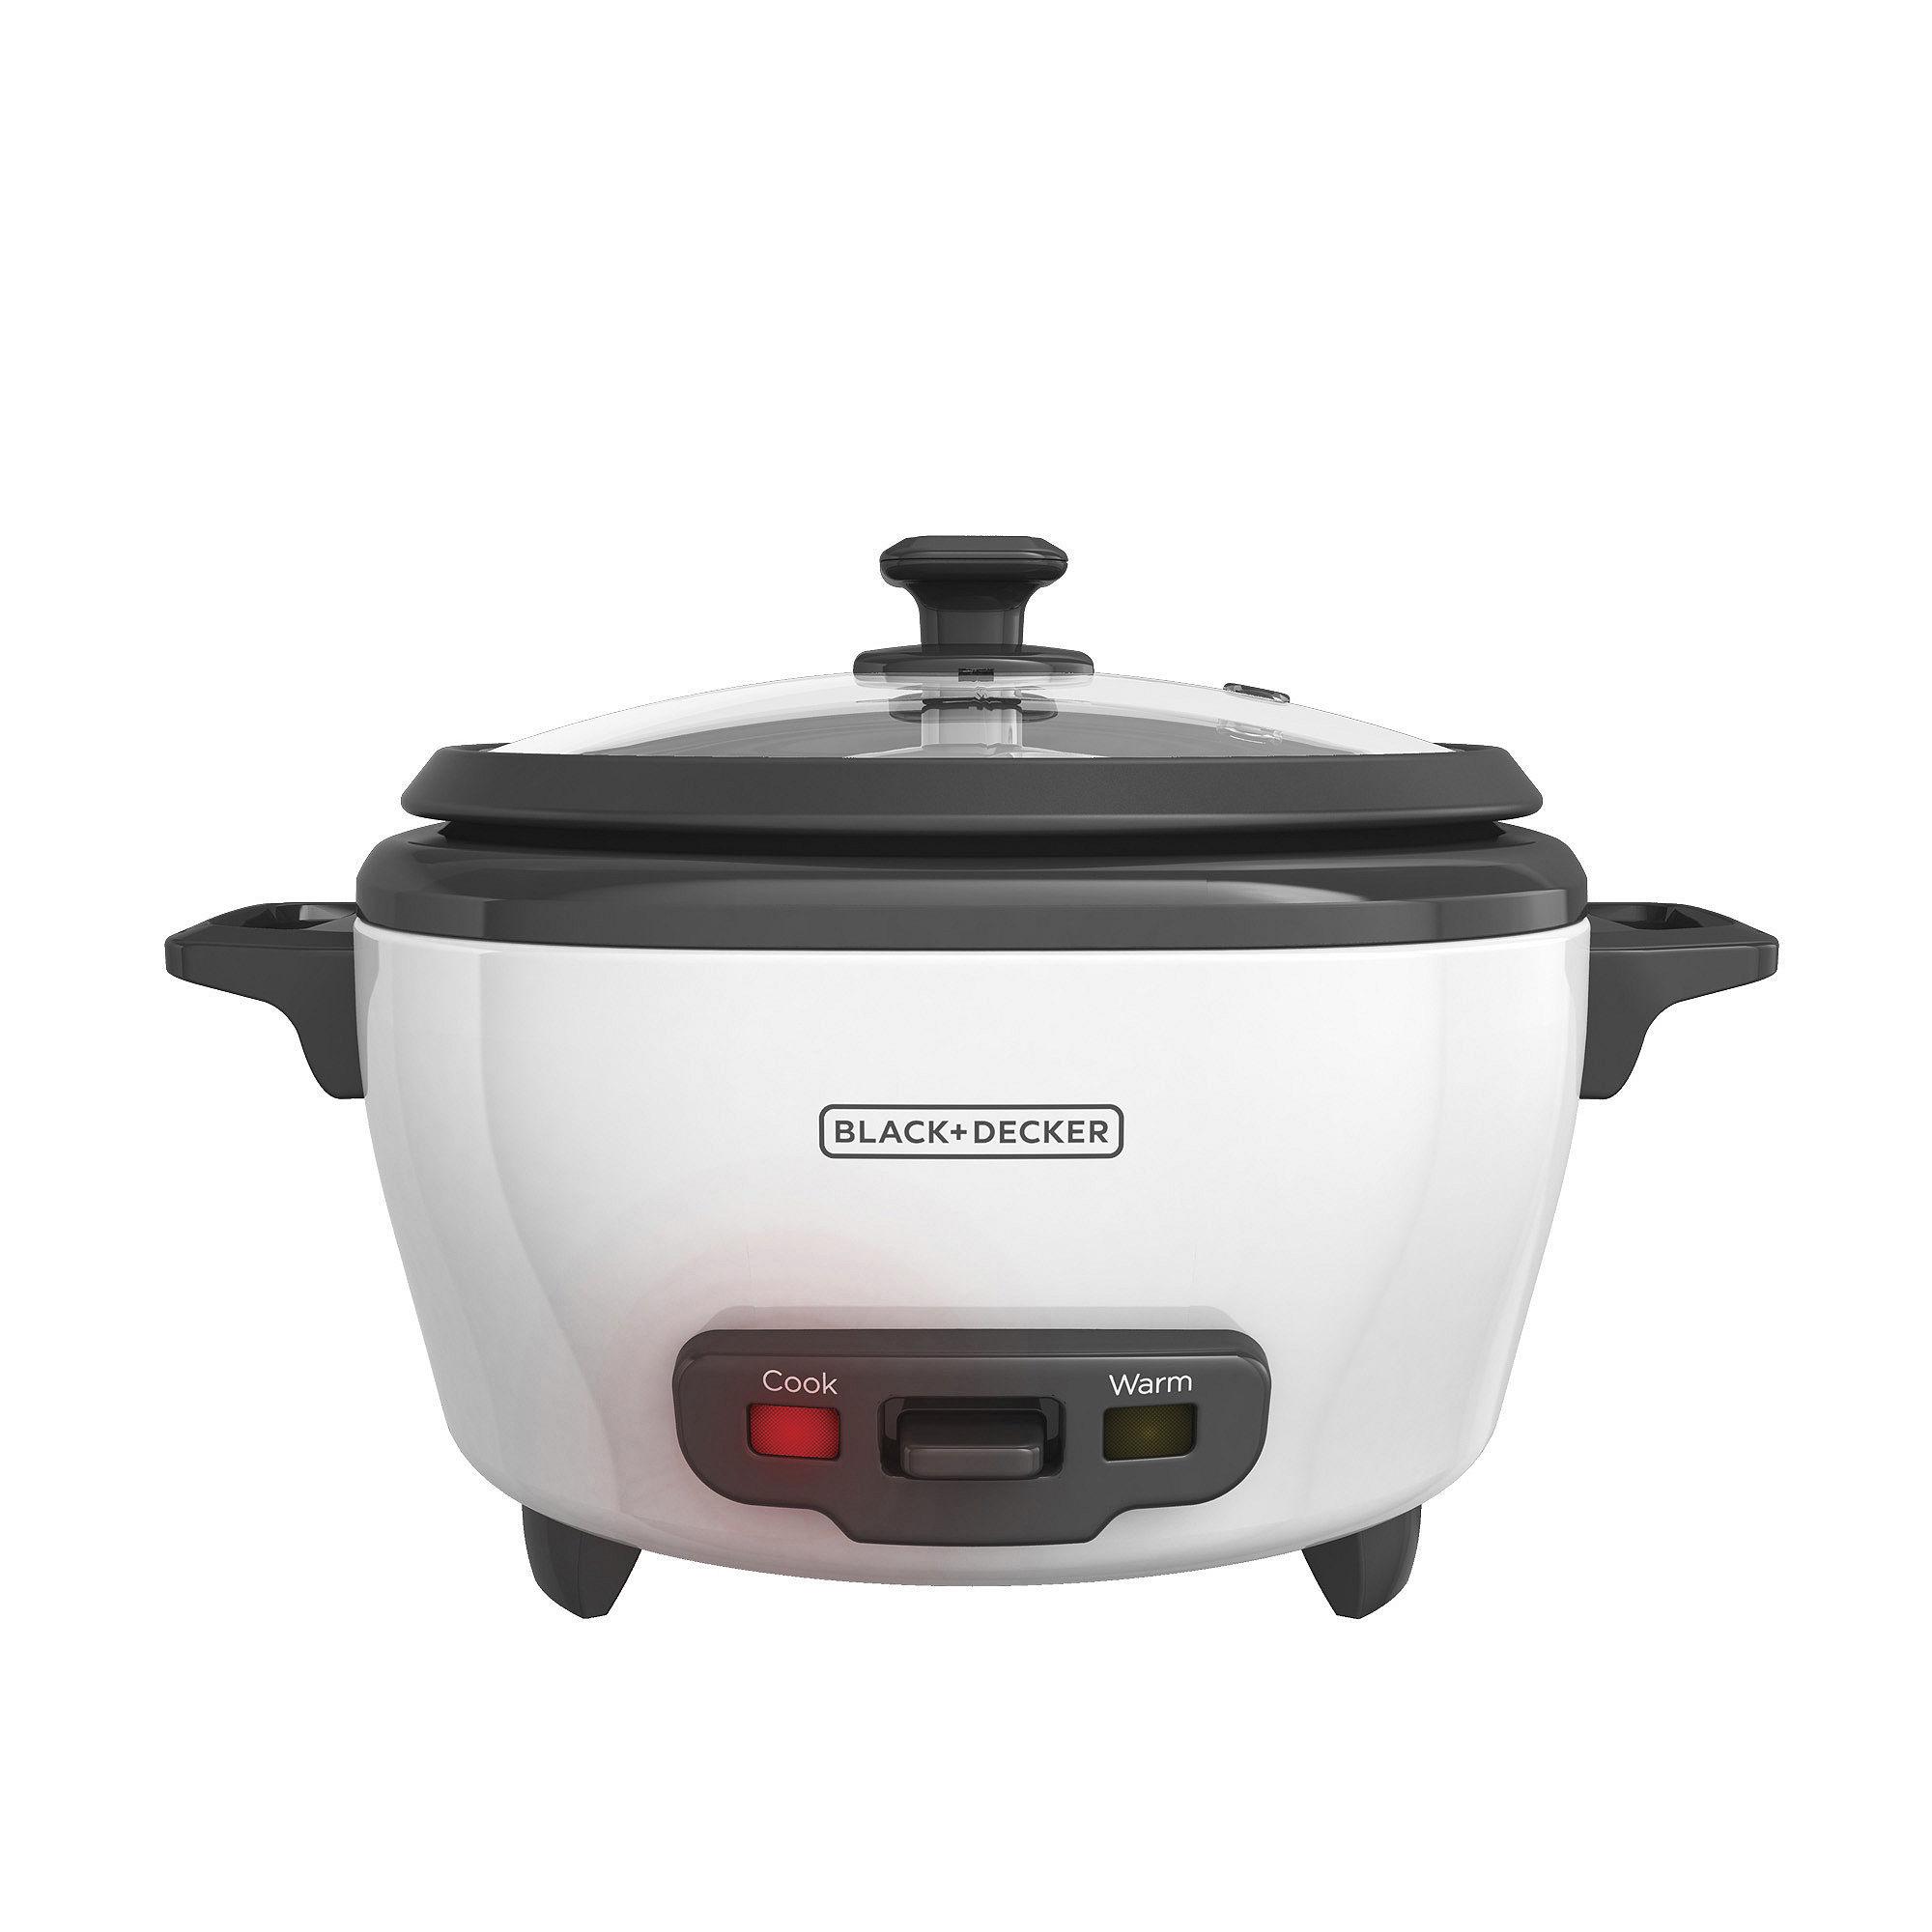 Black+Decker Rc506 Rice Cooker